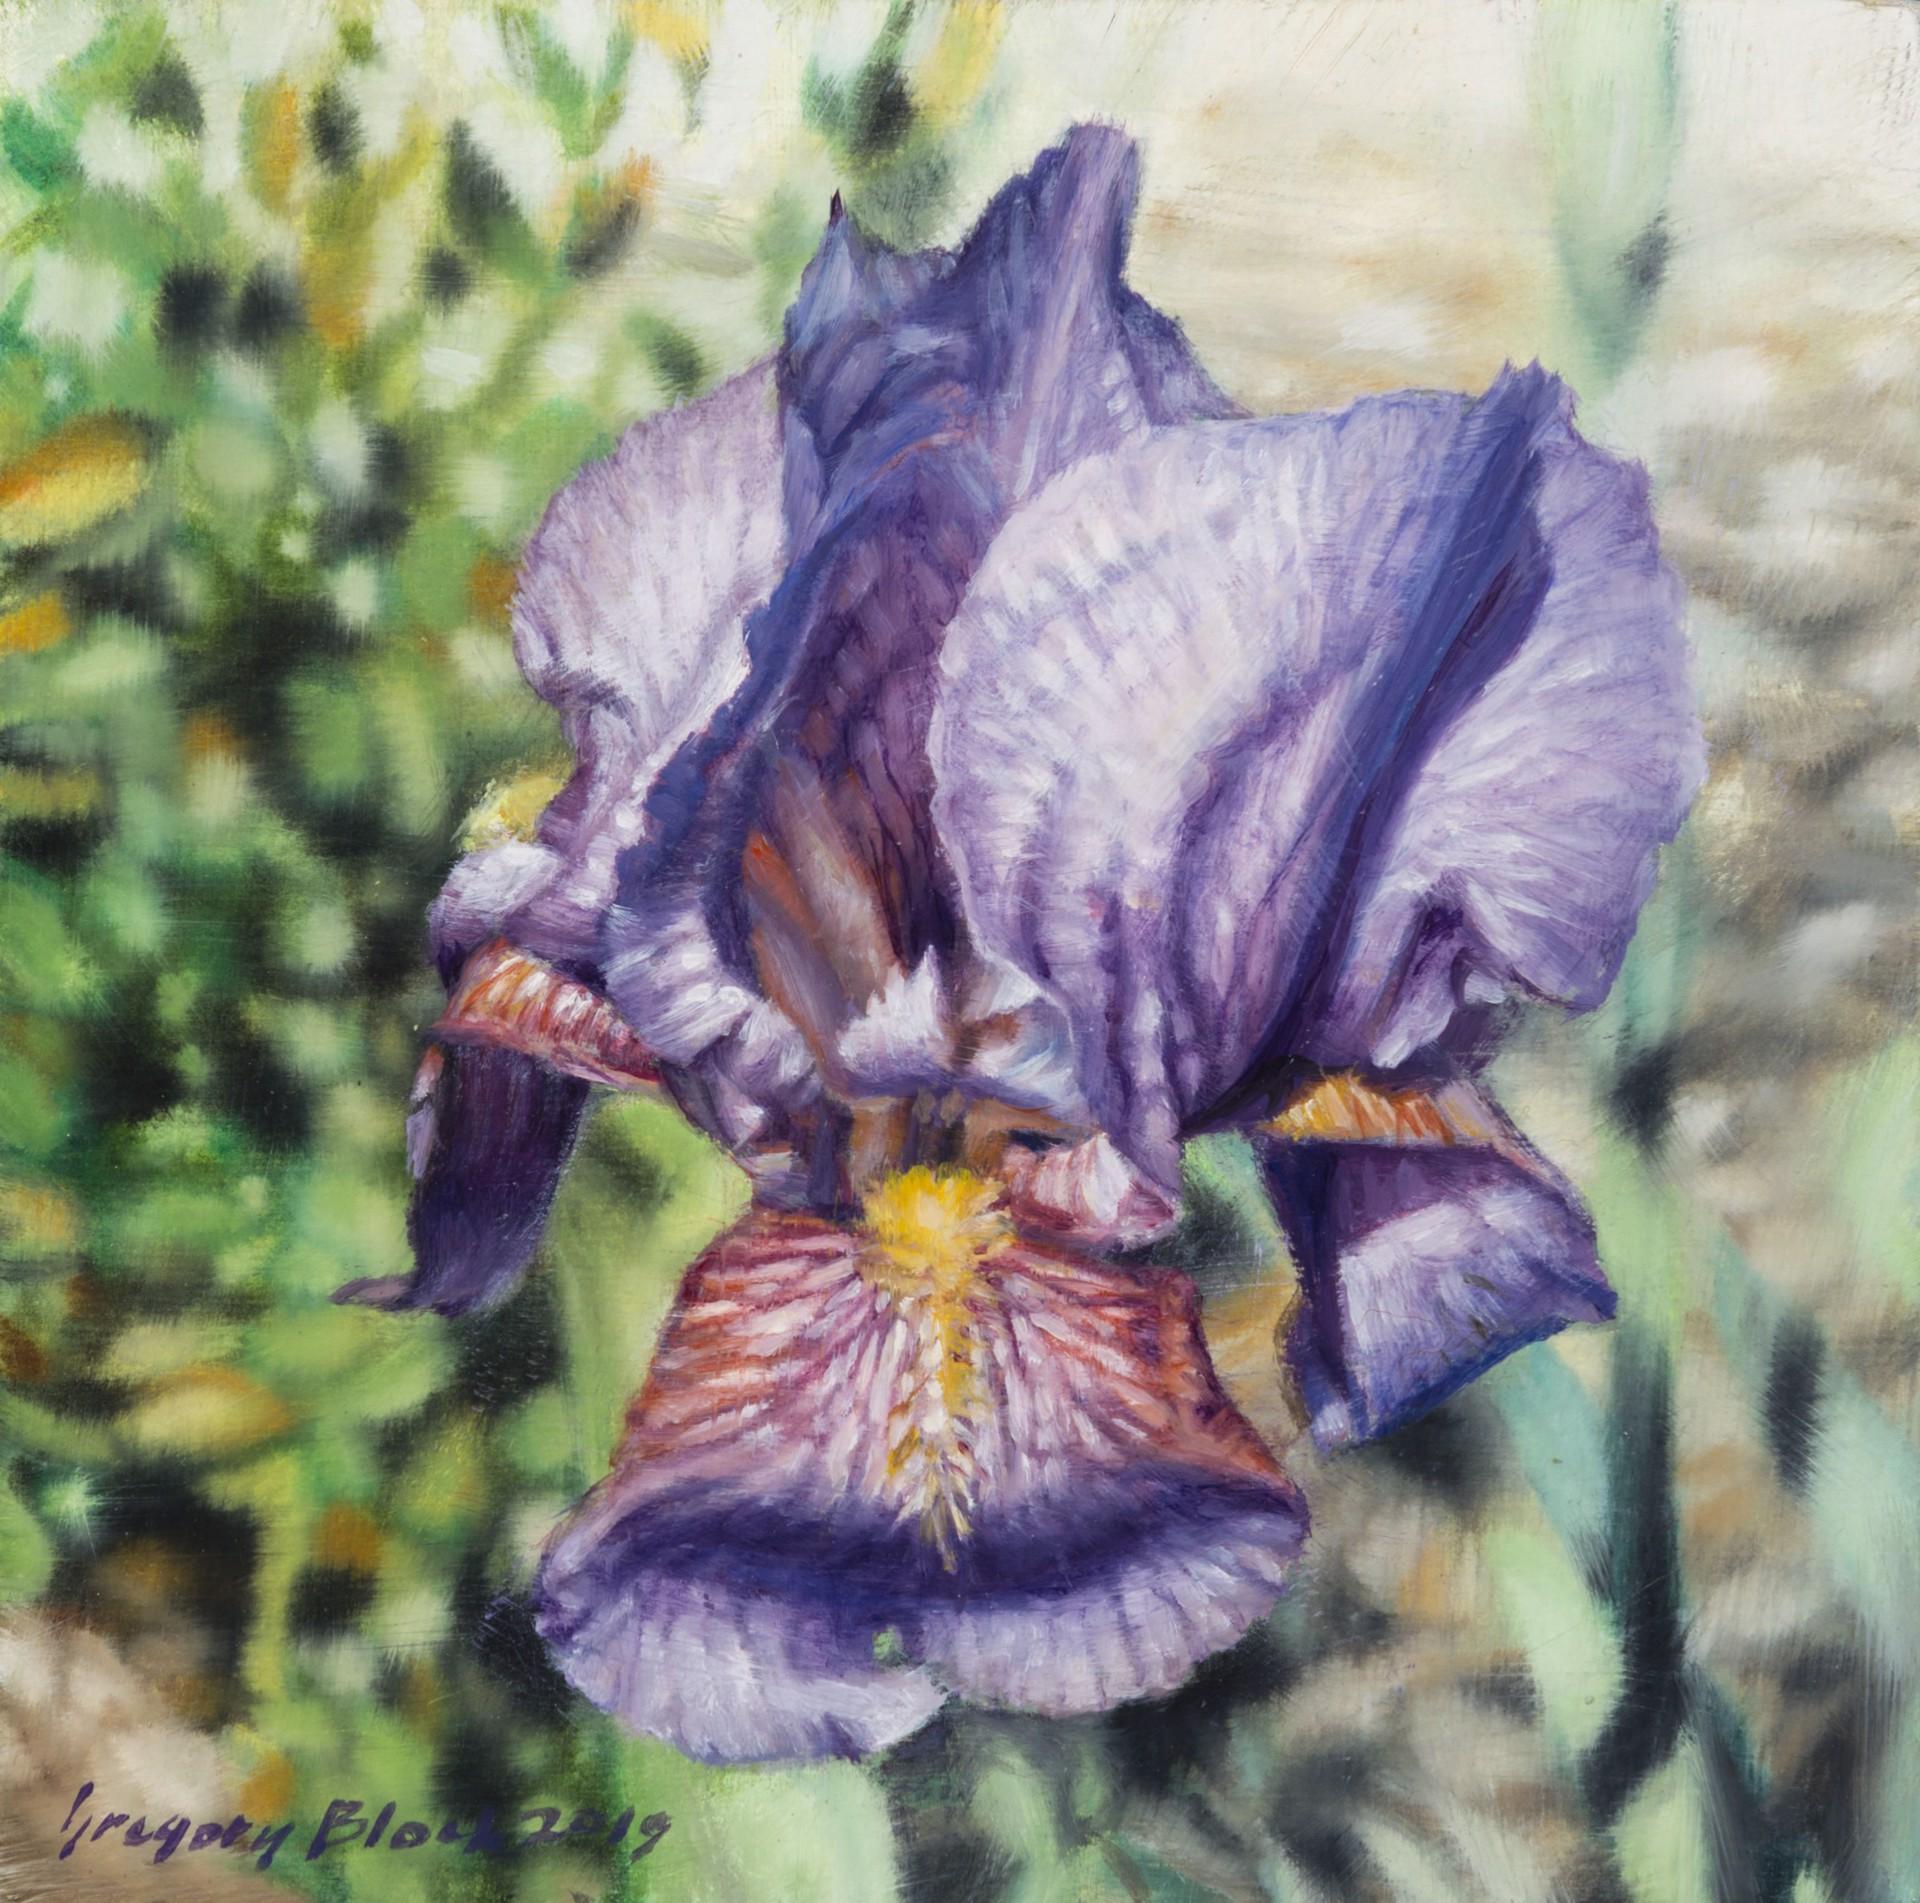 Iris 2 by Gregory Block